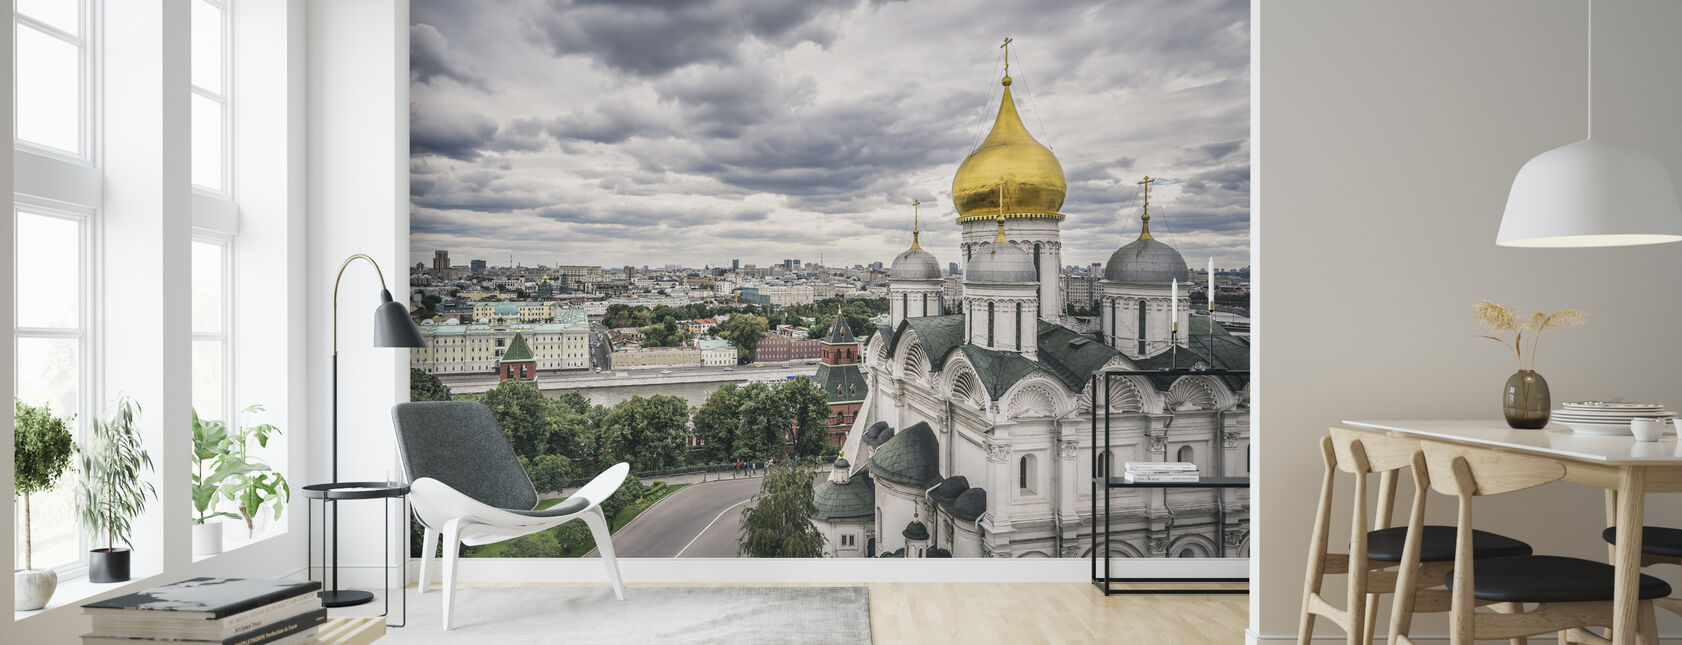 Grijze hemel boven Kremlin - Behang - Woonkamer